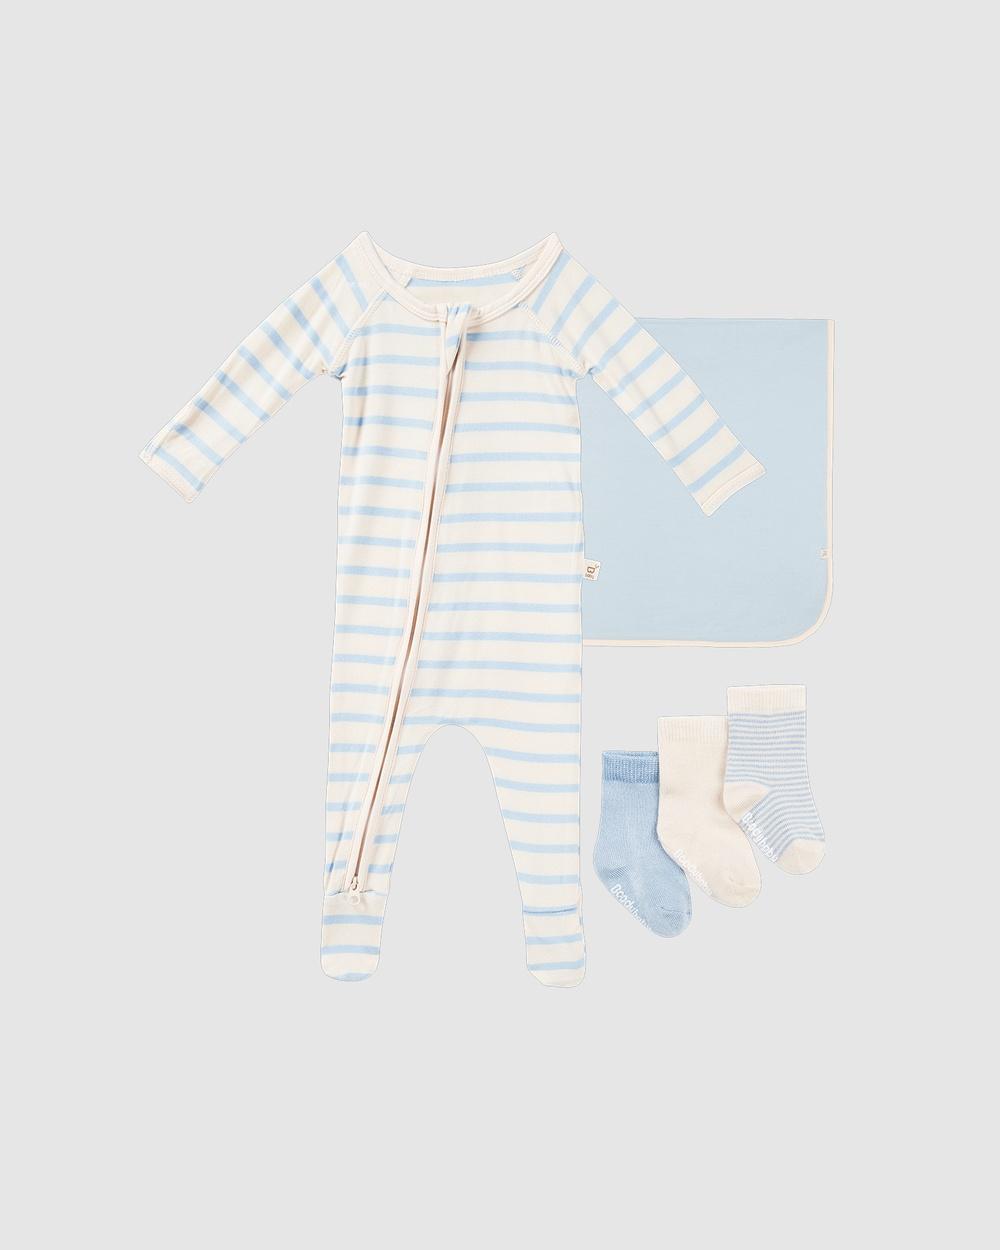 Boody Everything Bub Needs Gift Set 3 Items Wraps & Blankets Sky/Sky Stripe